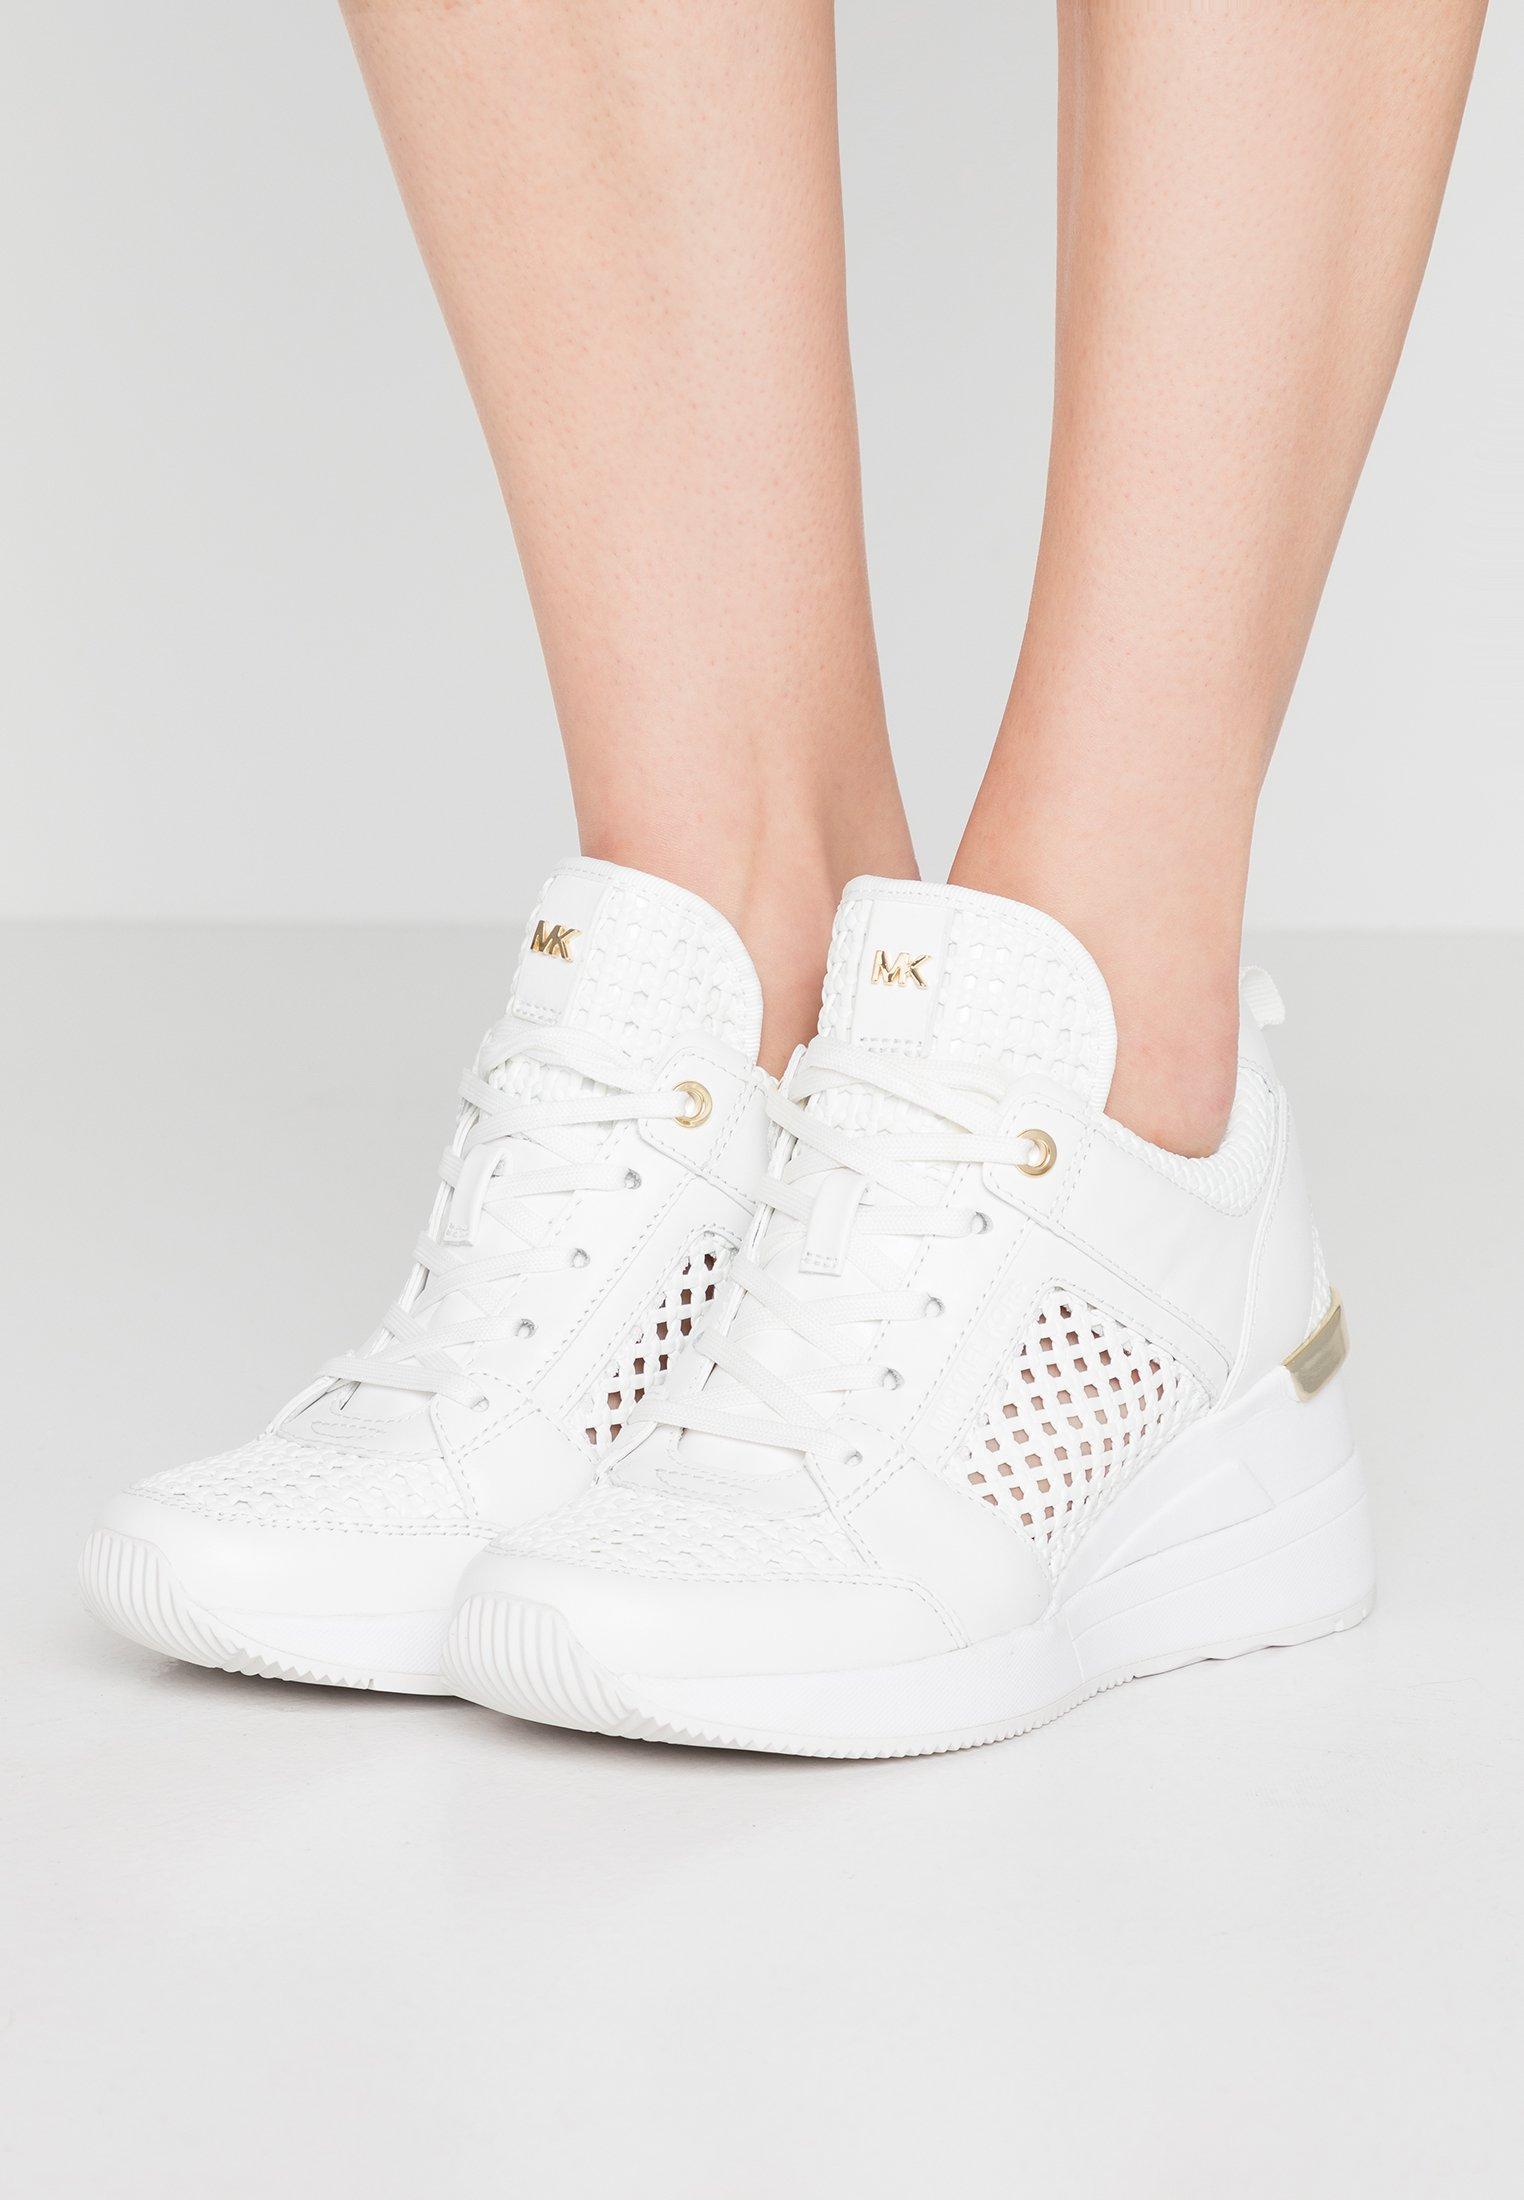 GEORGIE TRAINER Sneakers optic white